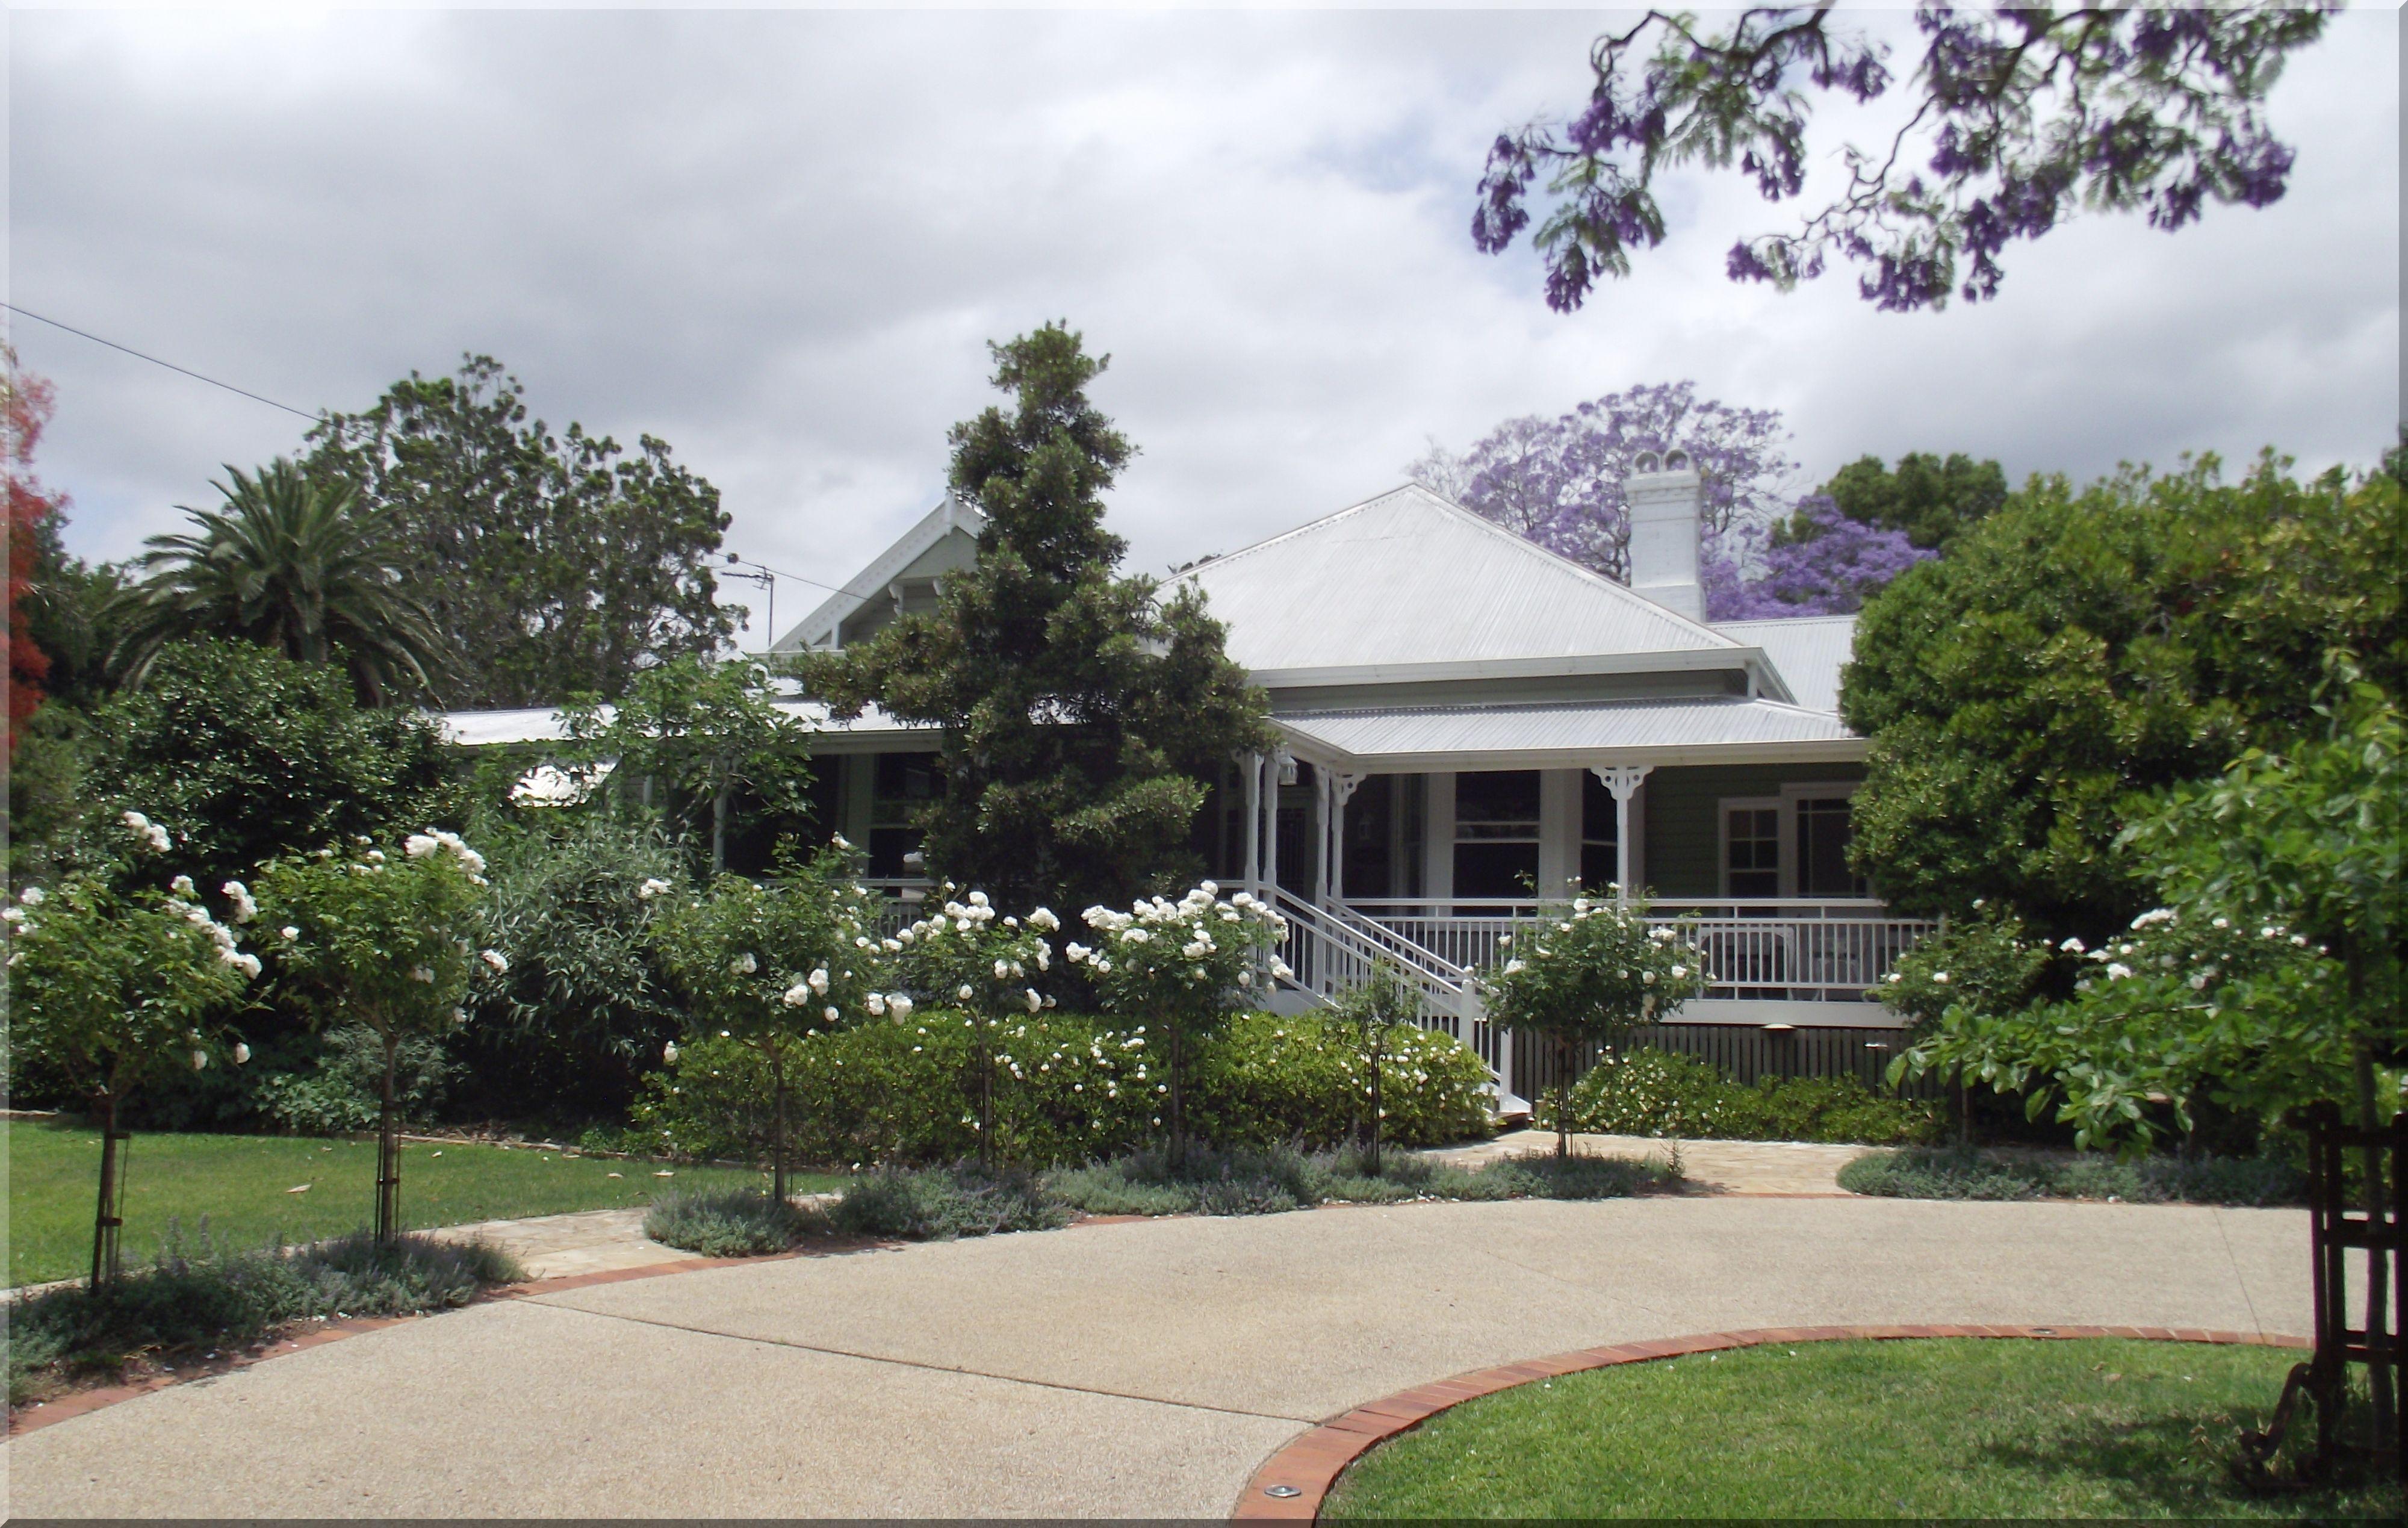 Federation-House - Toowoomba Heritage Houses